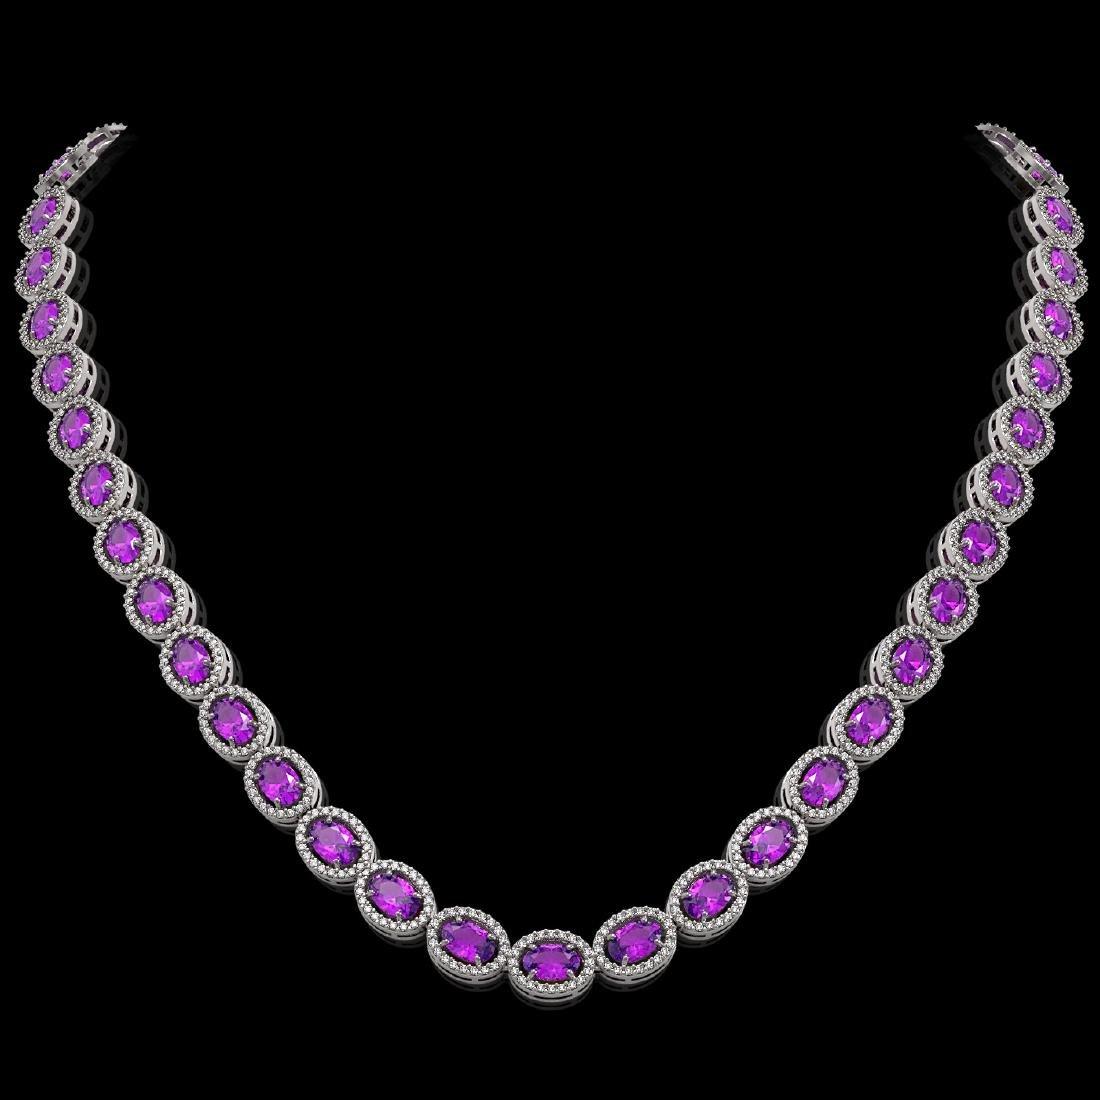 29.38 CTW Amethyst & Diamond Halo Necklace 10K White